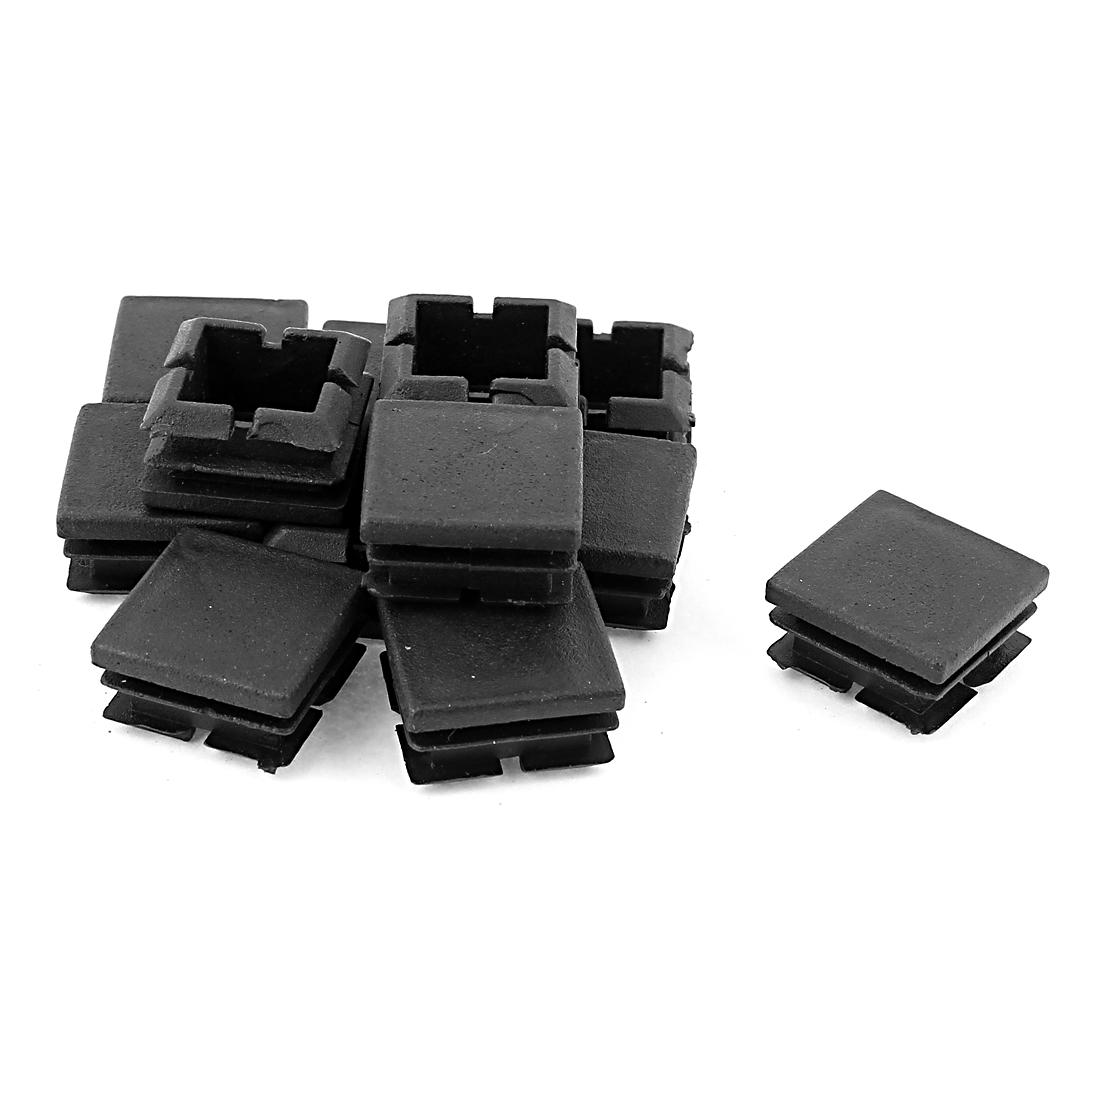 12 Pcs Black Plastic 25x25mm Pipe Blacking End Caps Tubing Insert Plugs Square